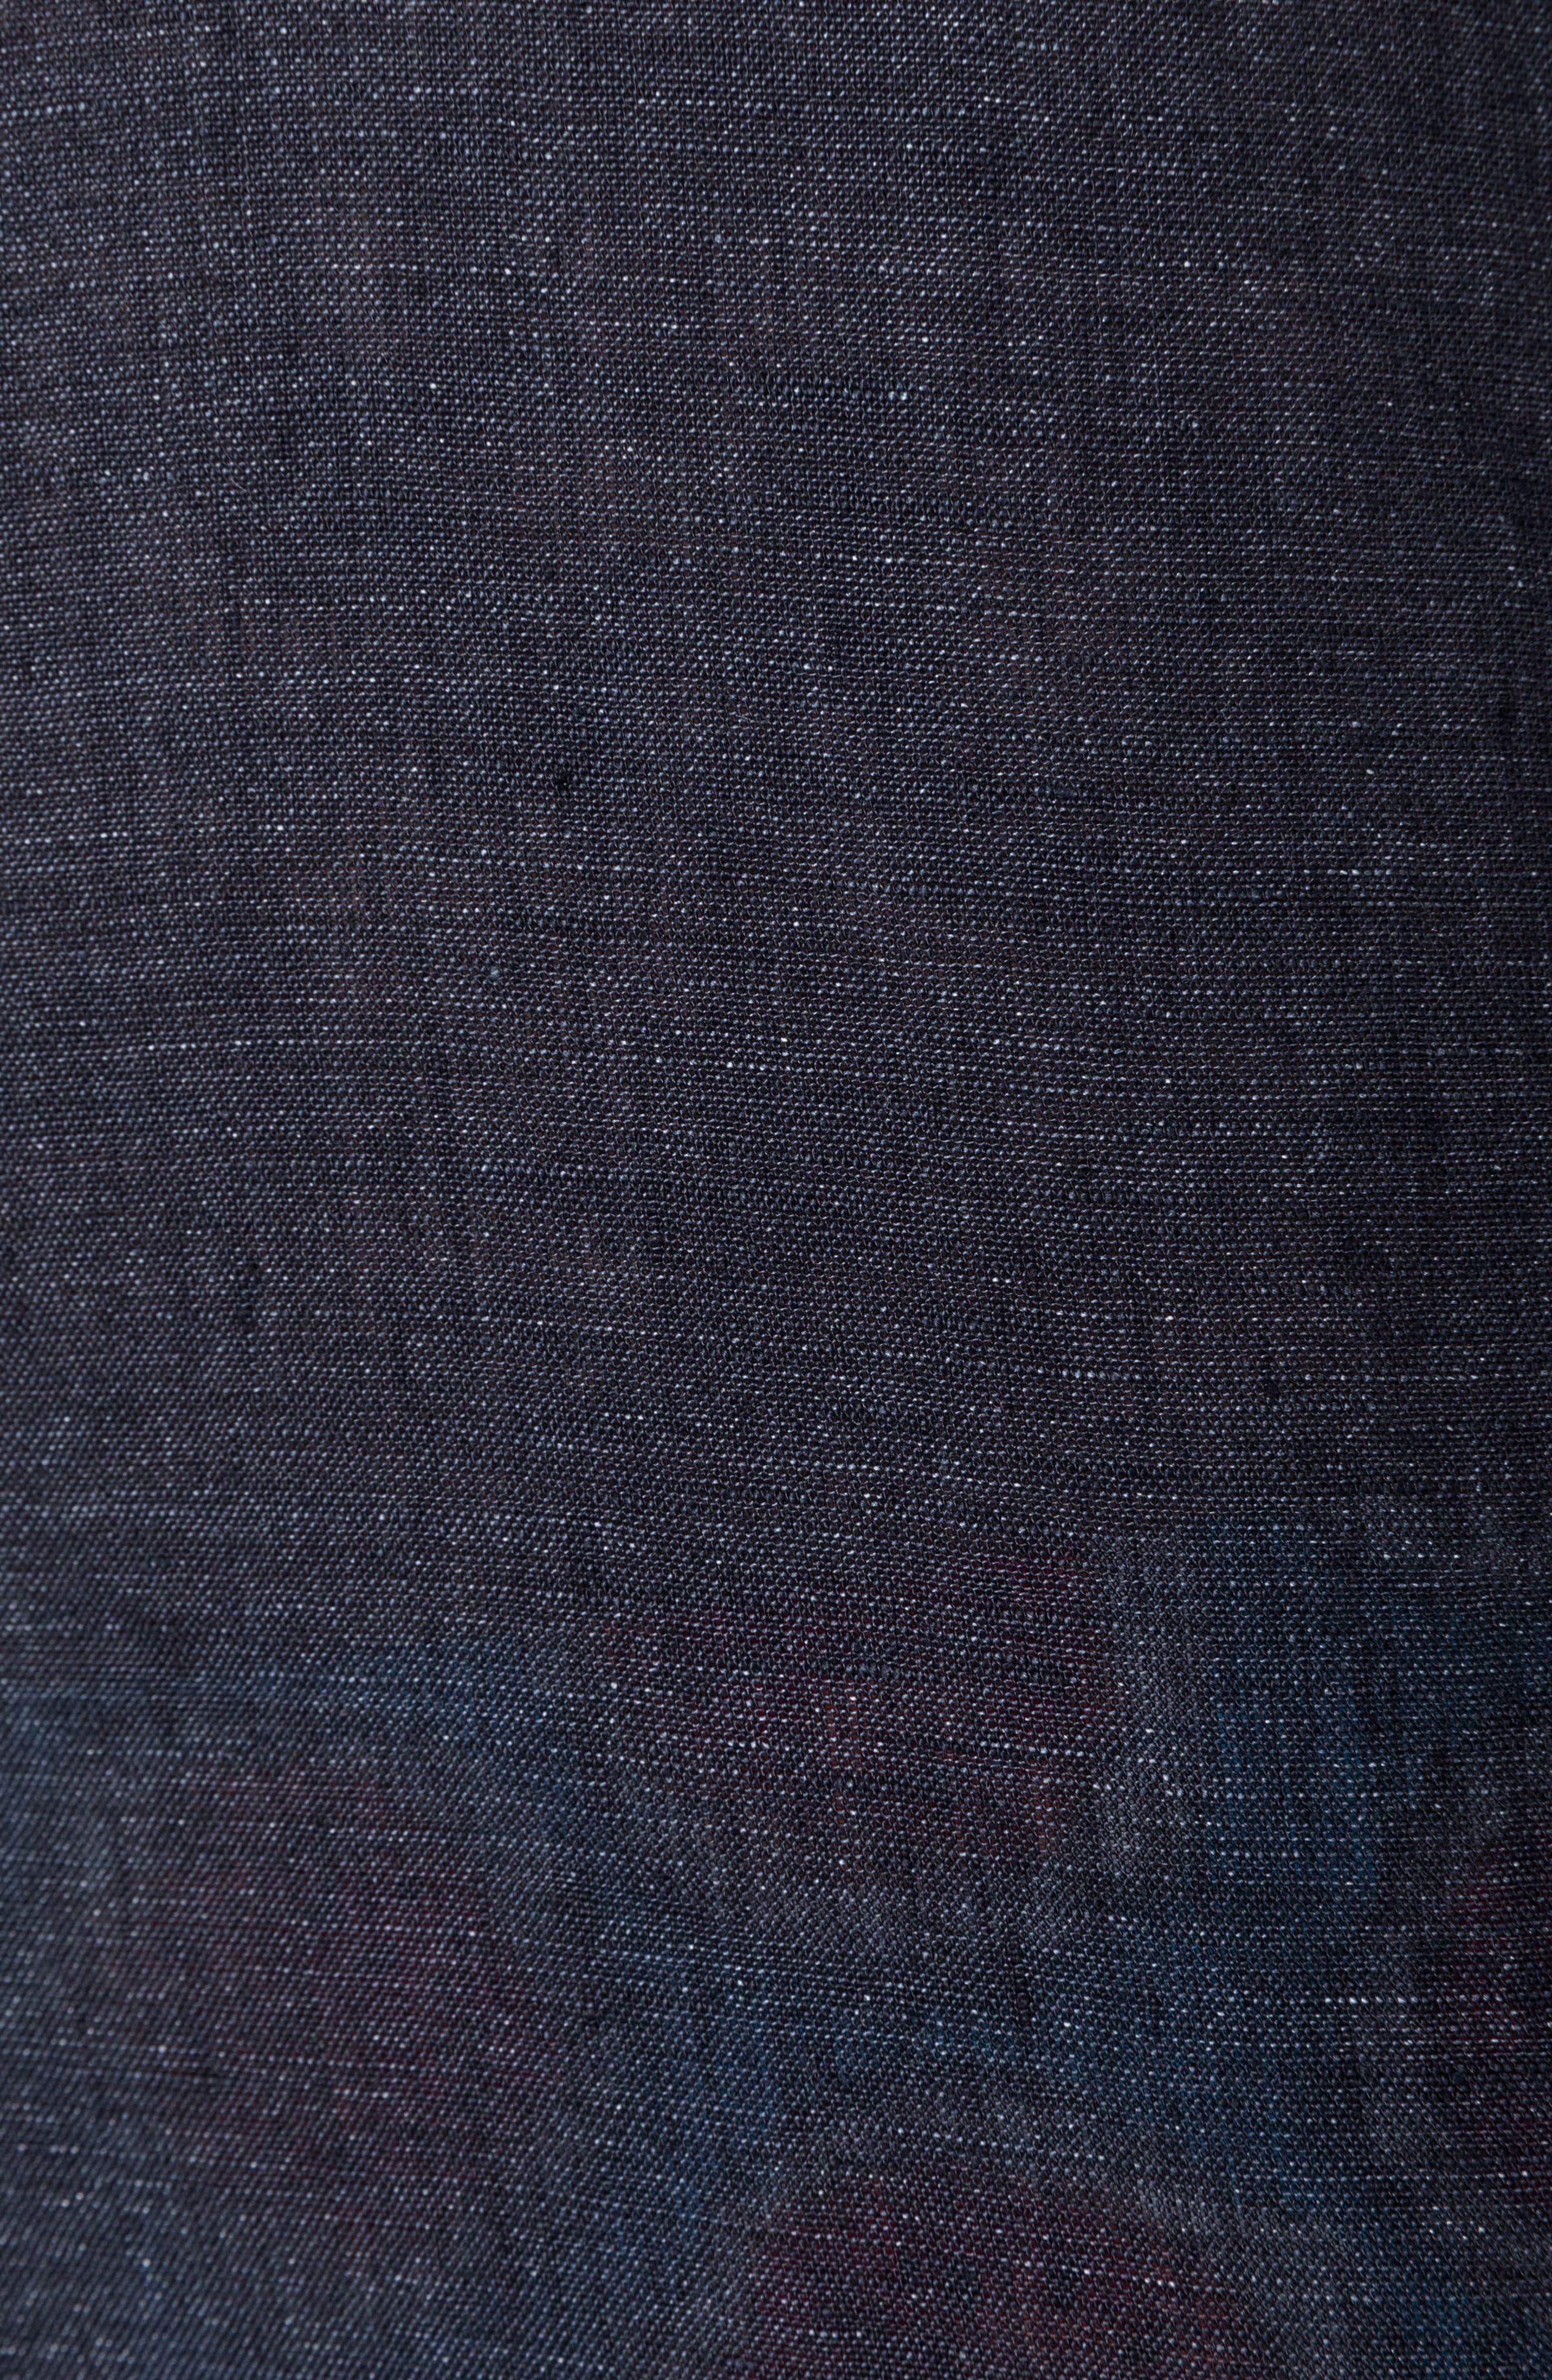 Landsdown Regular Fit Linen Sport Shirt,                             Alternate thumbnail 4, color,                             Charcoal